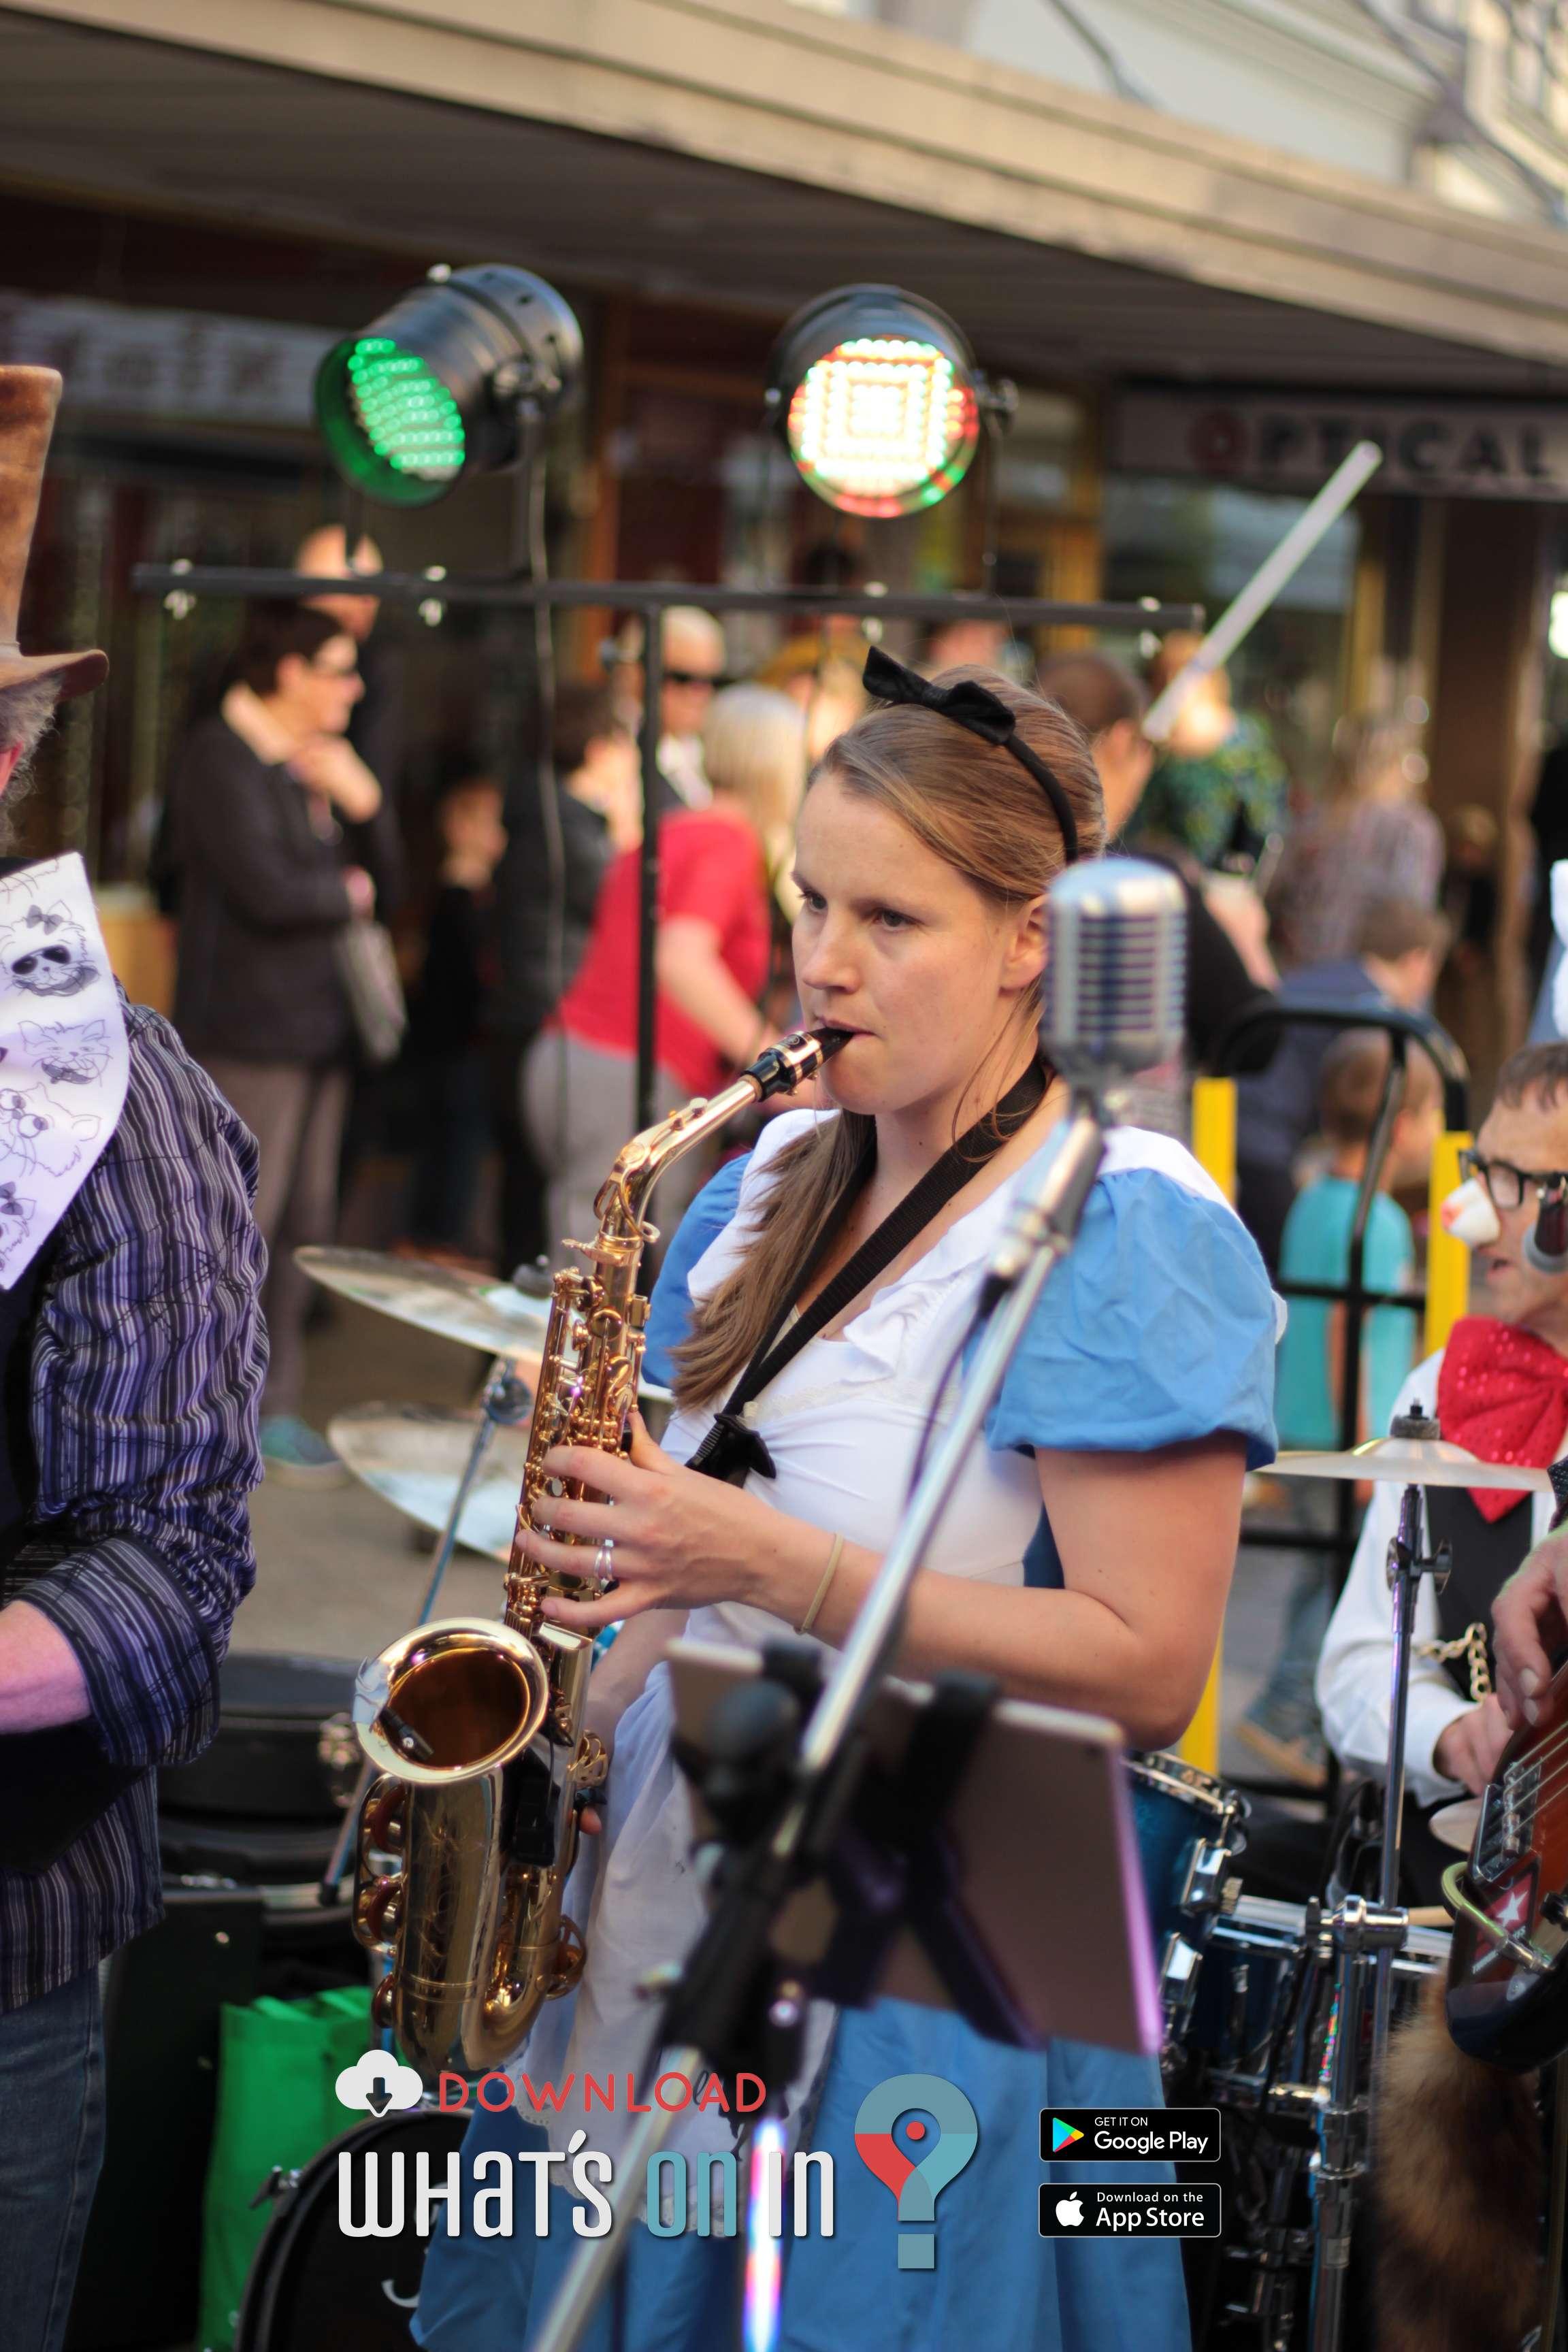 Mad Hatter's Twilight Markets, Launceston, Tasmania 2016 - What's On In App 005 IMG_8441.jpg